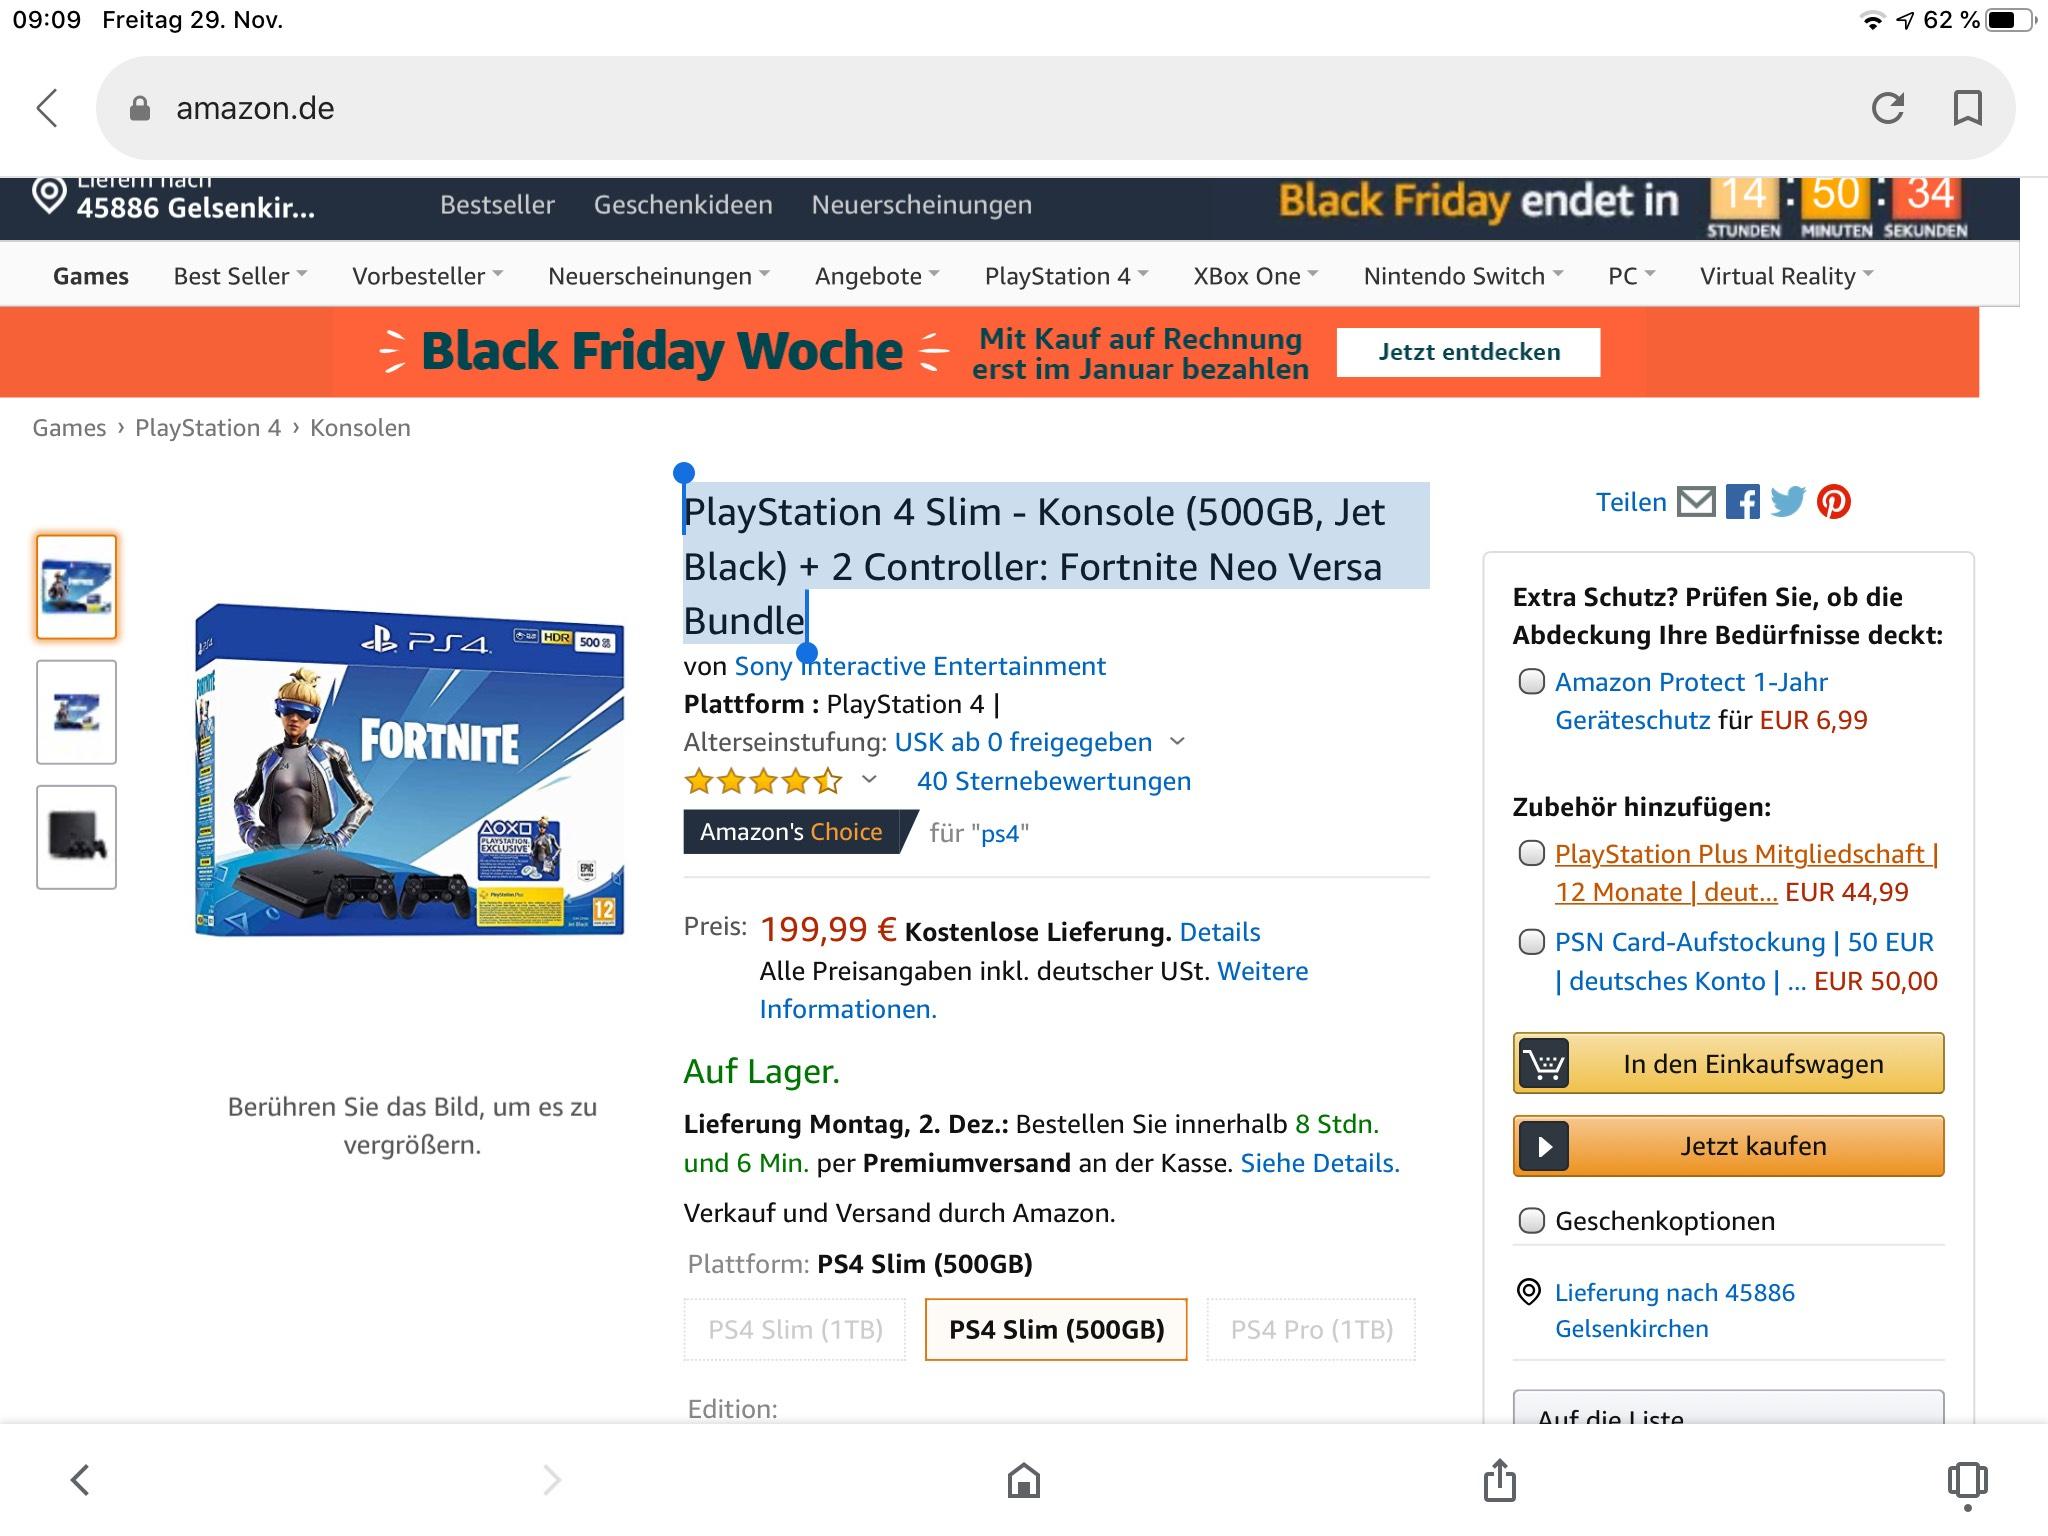 Fortnite Bundle mit 2 Controllern PlayStation 4 Slim - Konsole (500GB, Jet Black) + 2 Controller: Fortnite Neo Versa Bundle